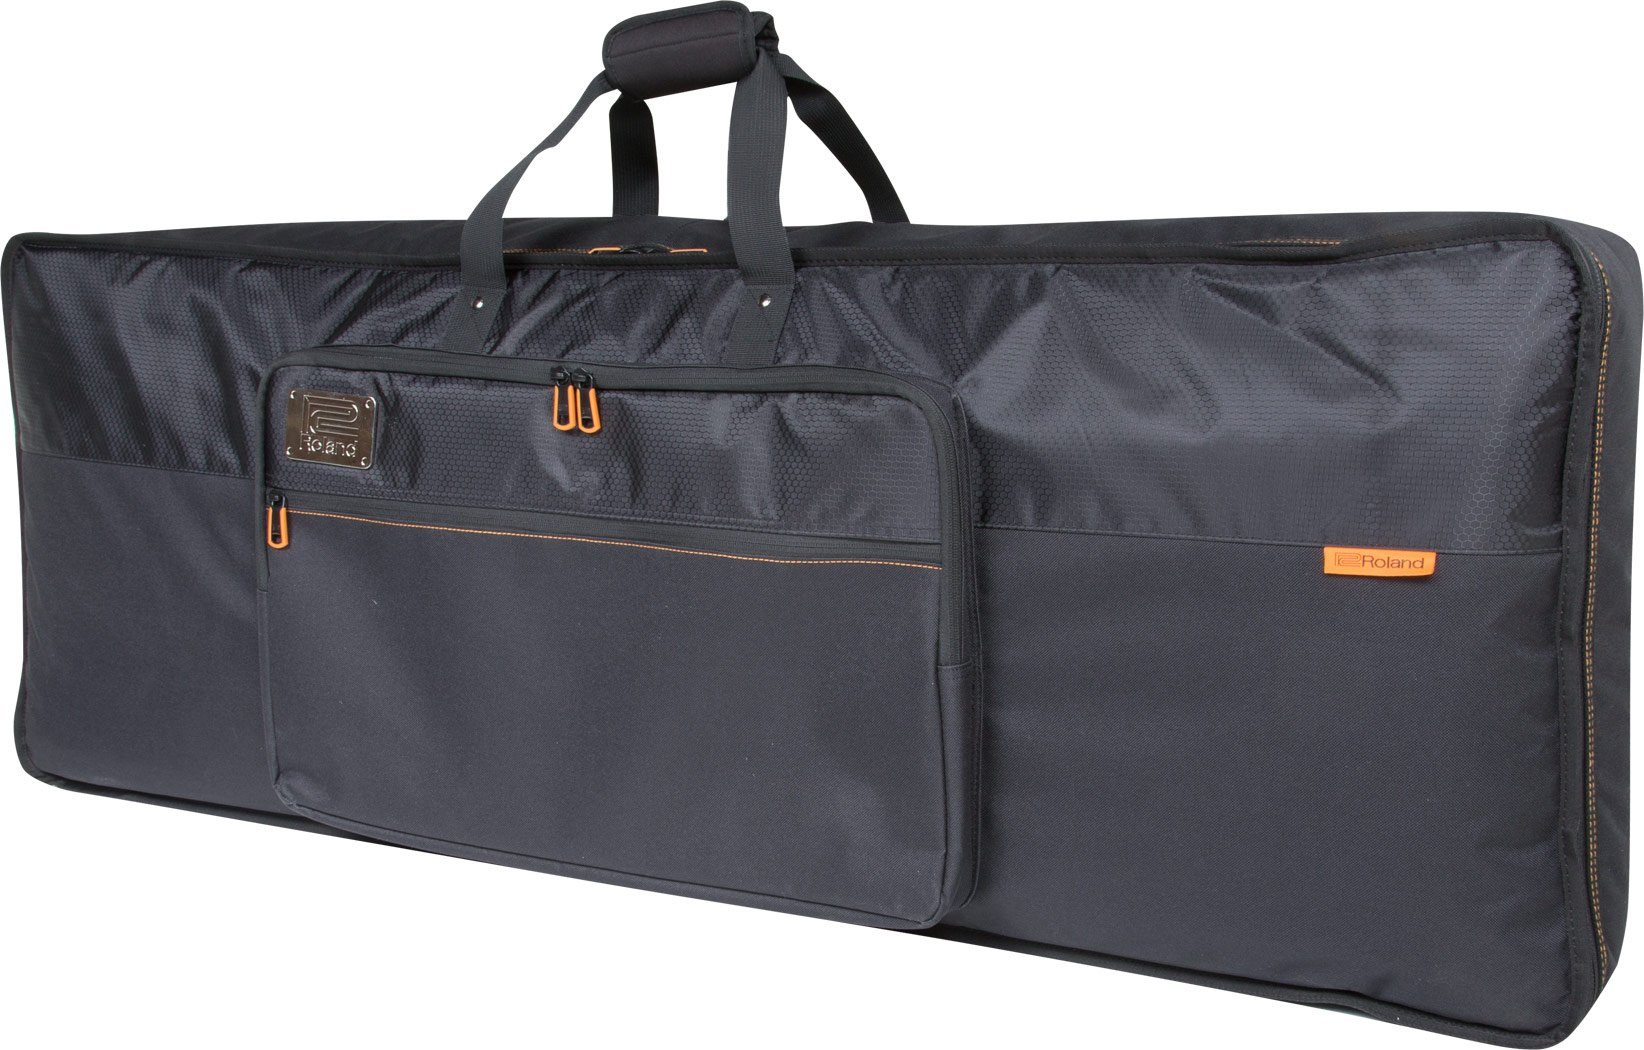 Roland CB-B61 61 Note Keyboard Bag w/Sholder Strap